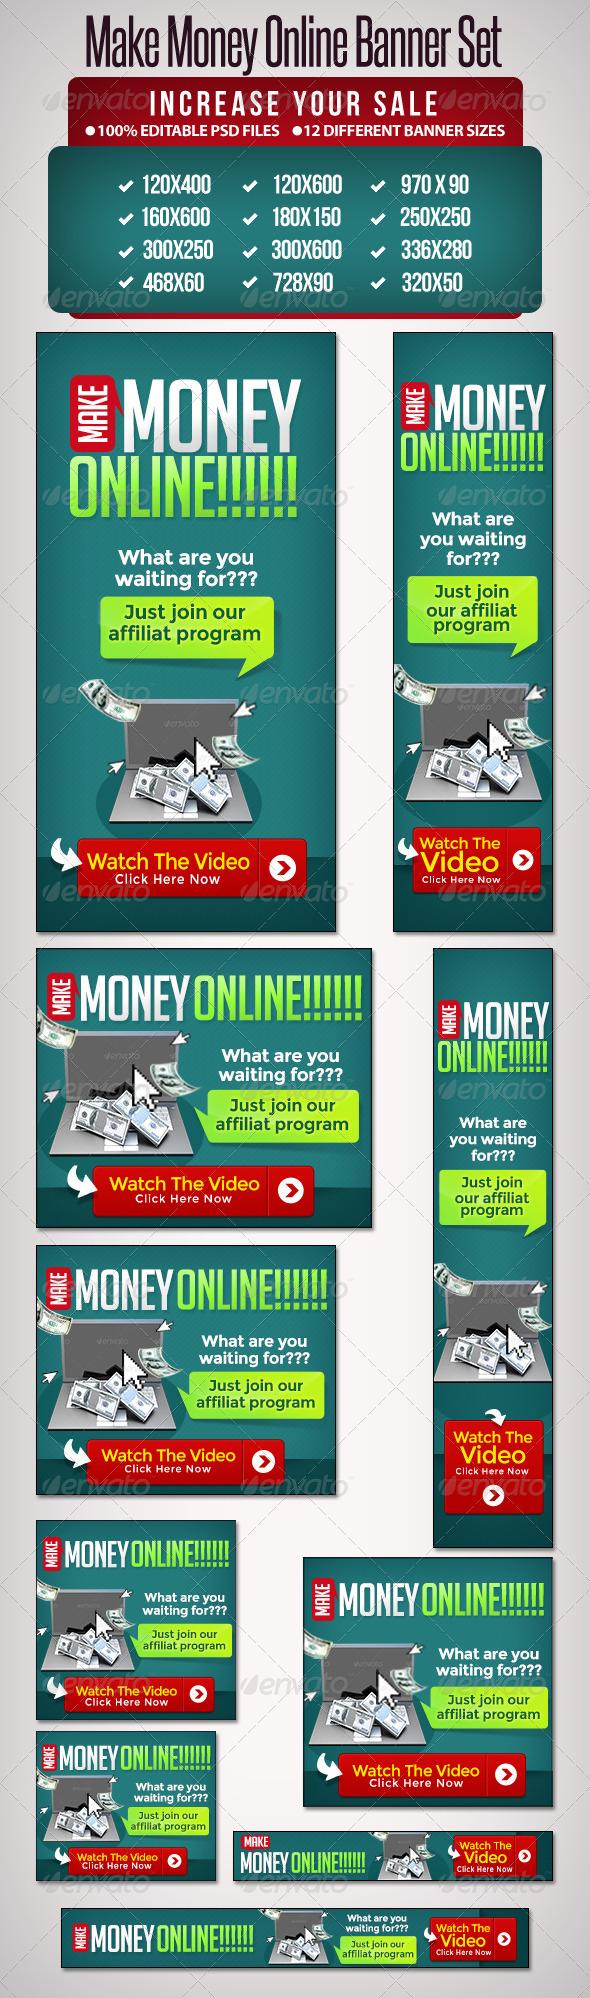 GraphicRiver Make Money Online Banner Set 3 12 Google Sizes 5283119